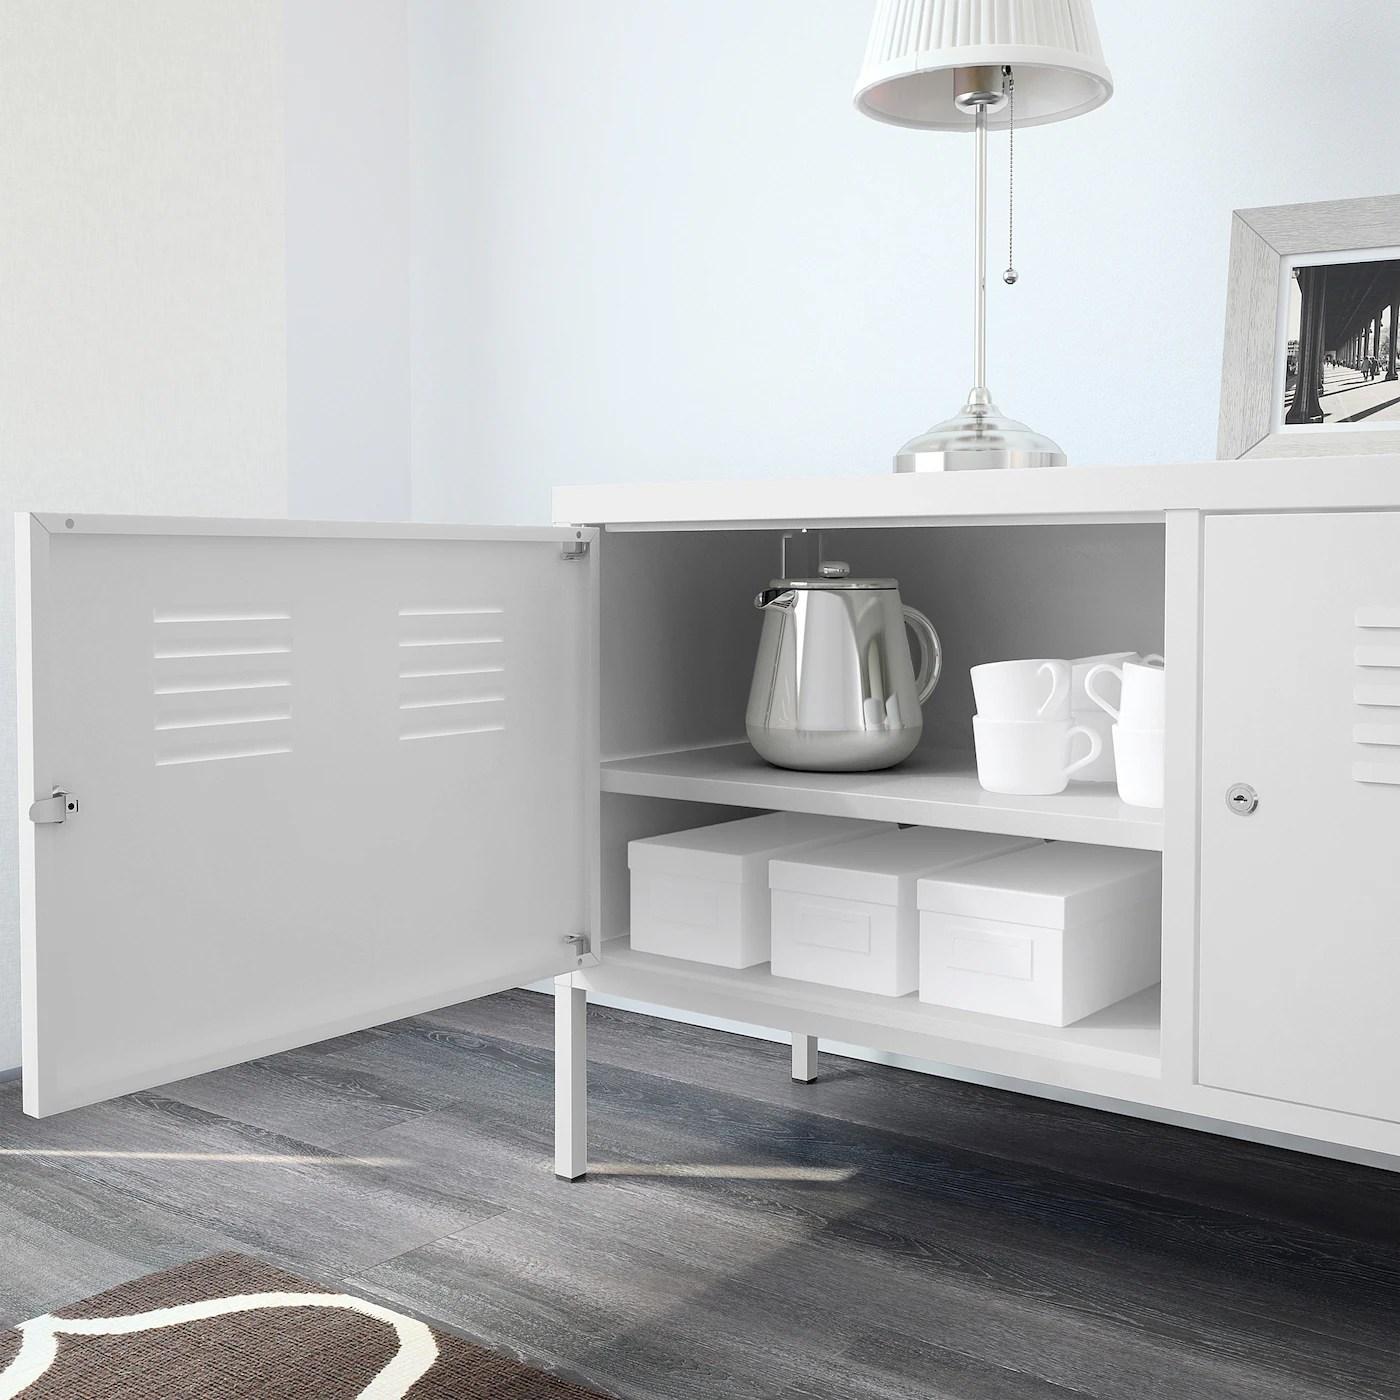 Ikea Ps Cabinet White 46 7 8x24 3 4 Ikea